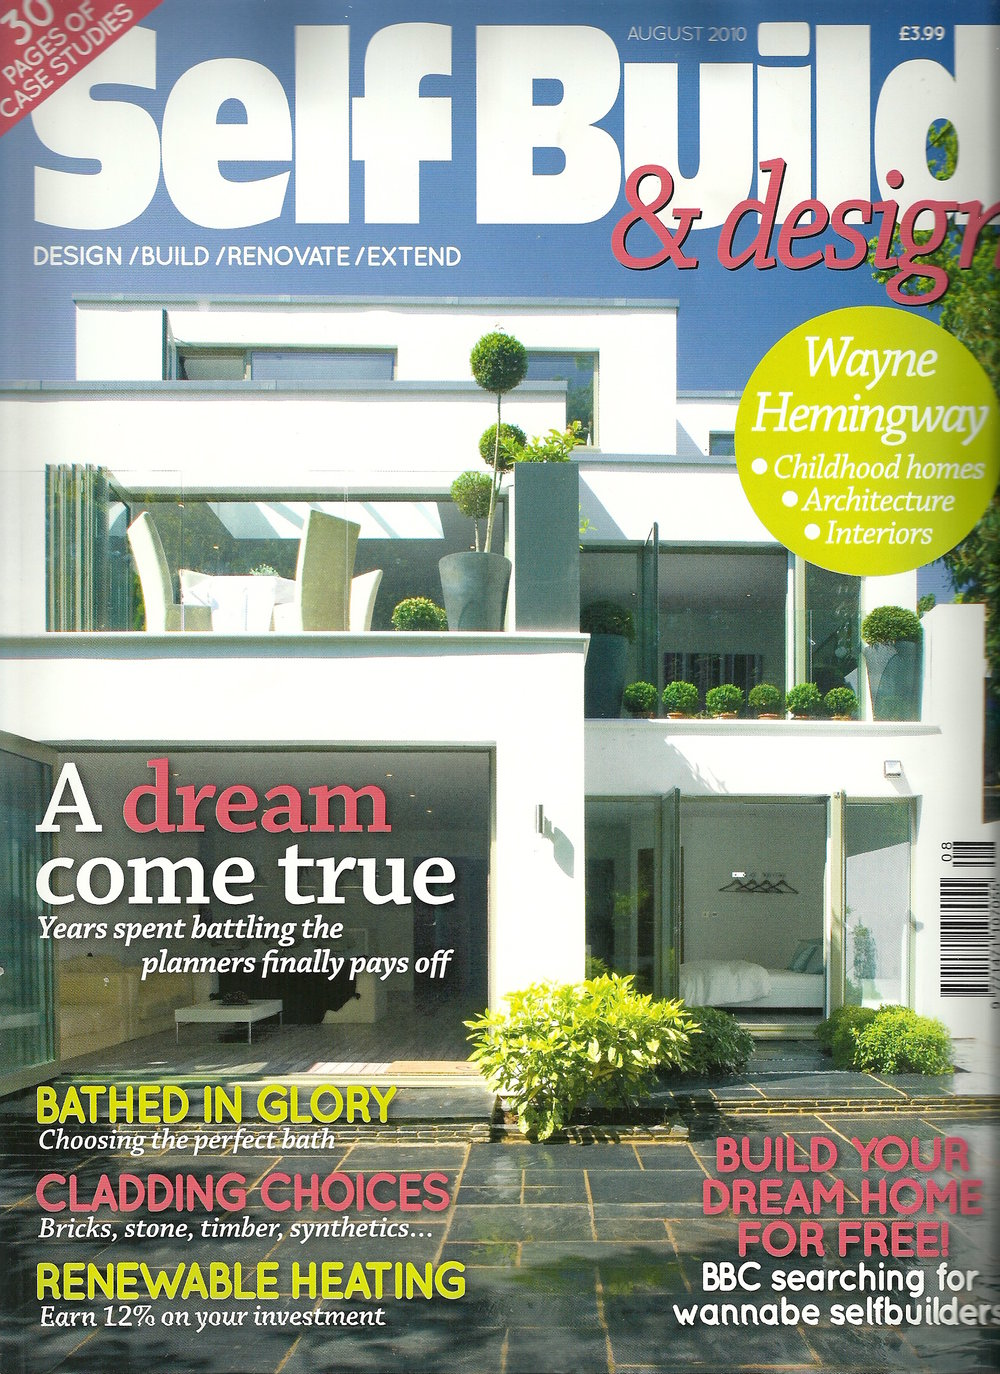 SelfBuild&Design_Warwick_Park_OB_Aug_2010